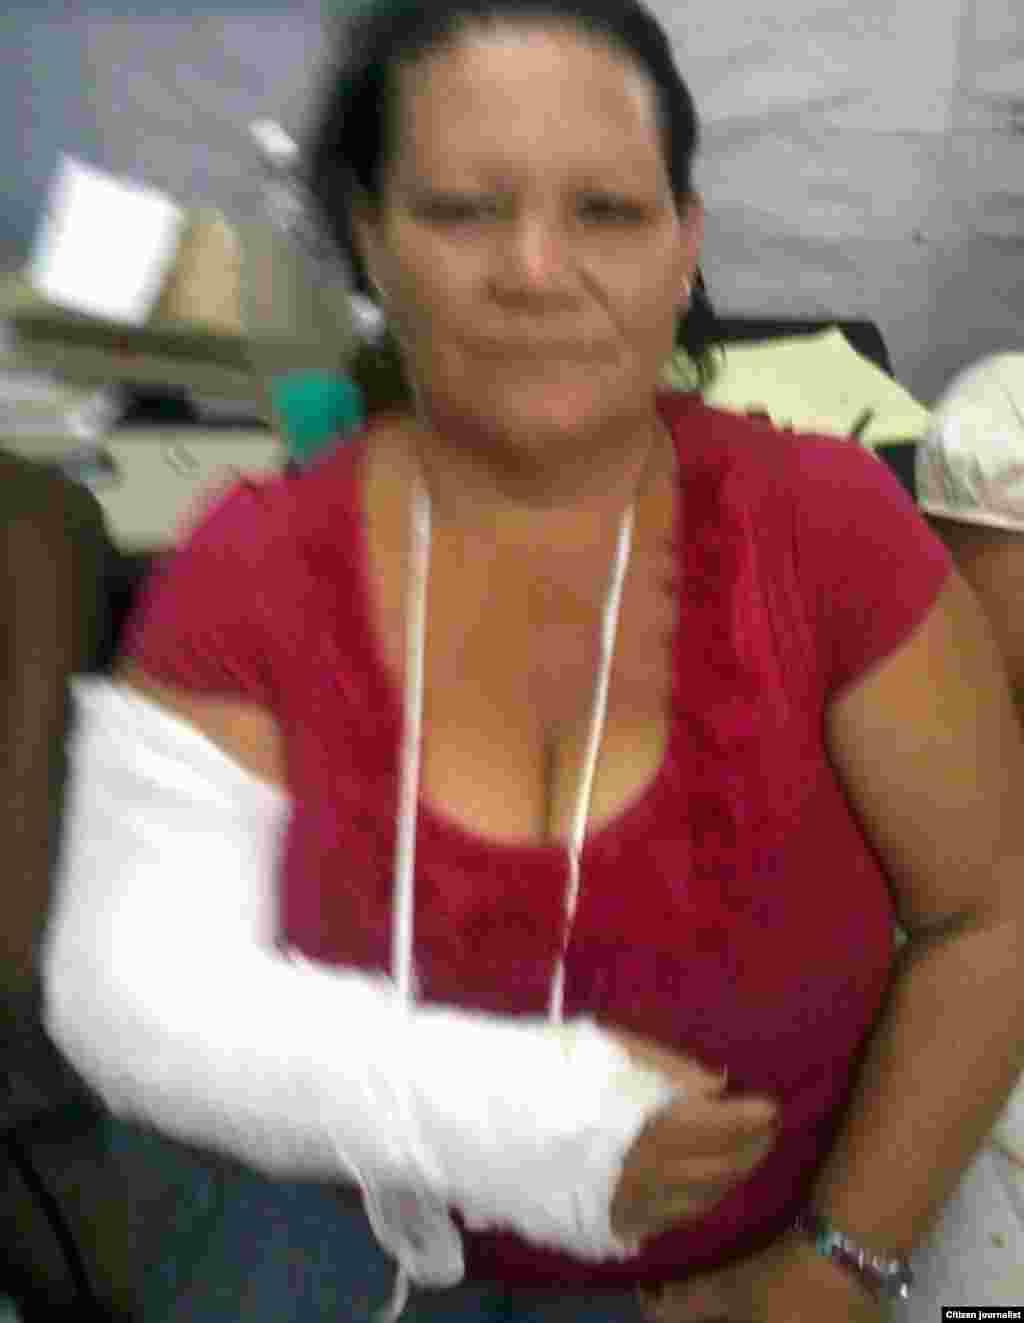 A la activista Graciela Dominguez le fracturaron un brazo.